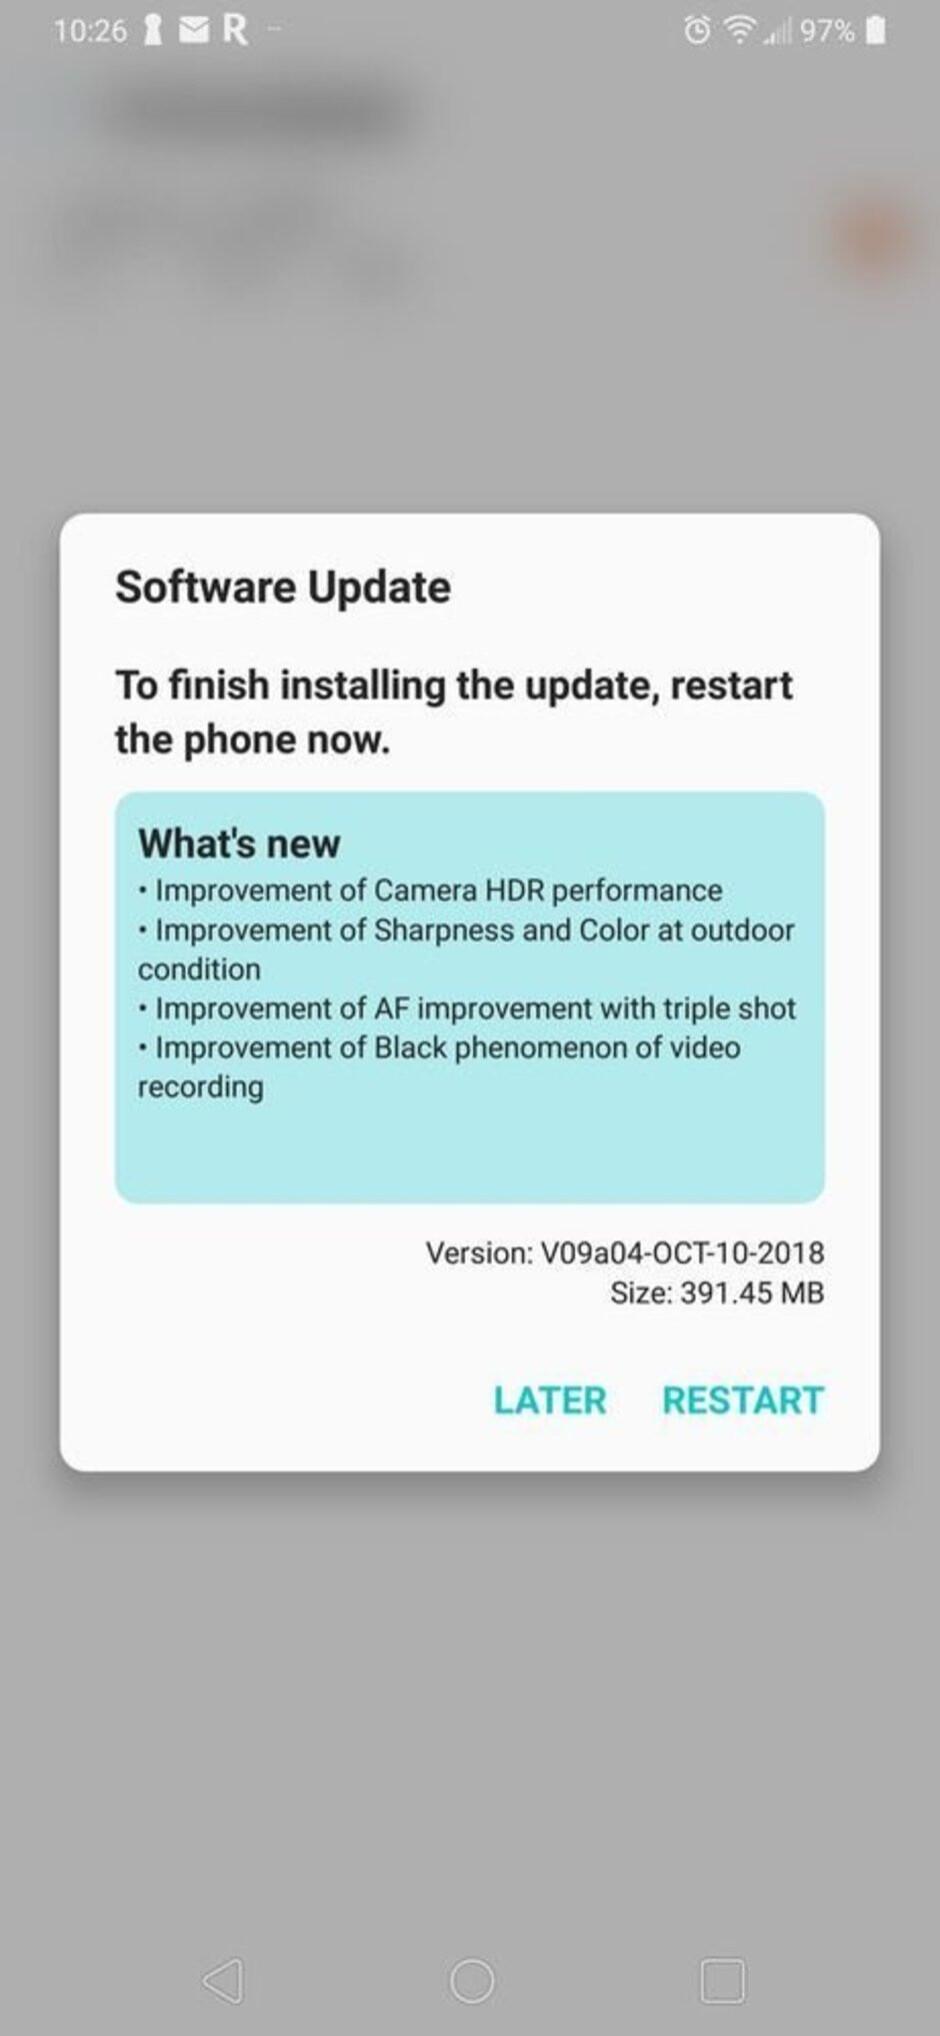 LG V40 update brings more camera improvements ahead of market release